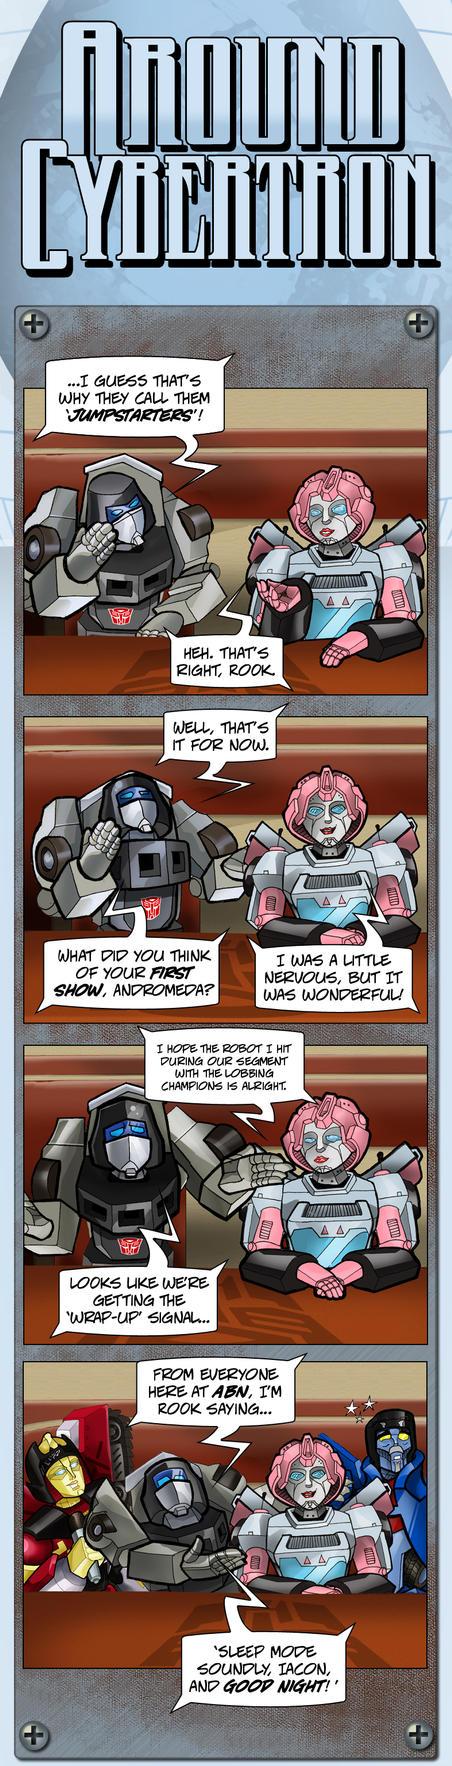 Around Cybertron Part 18 by RID-NightViper